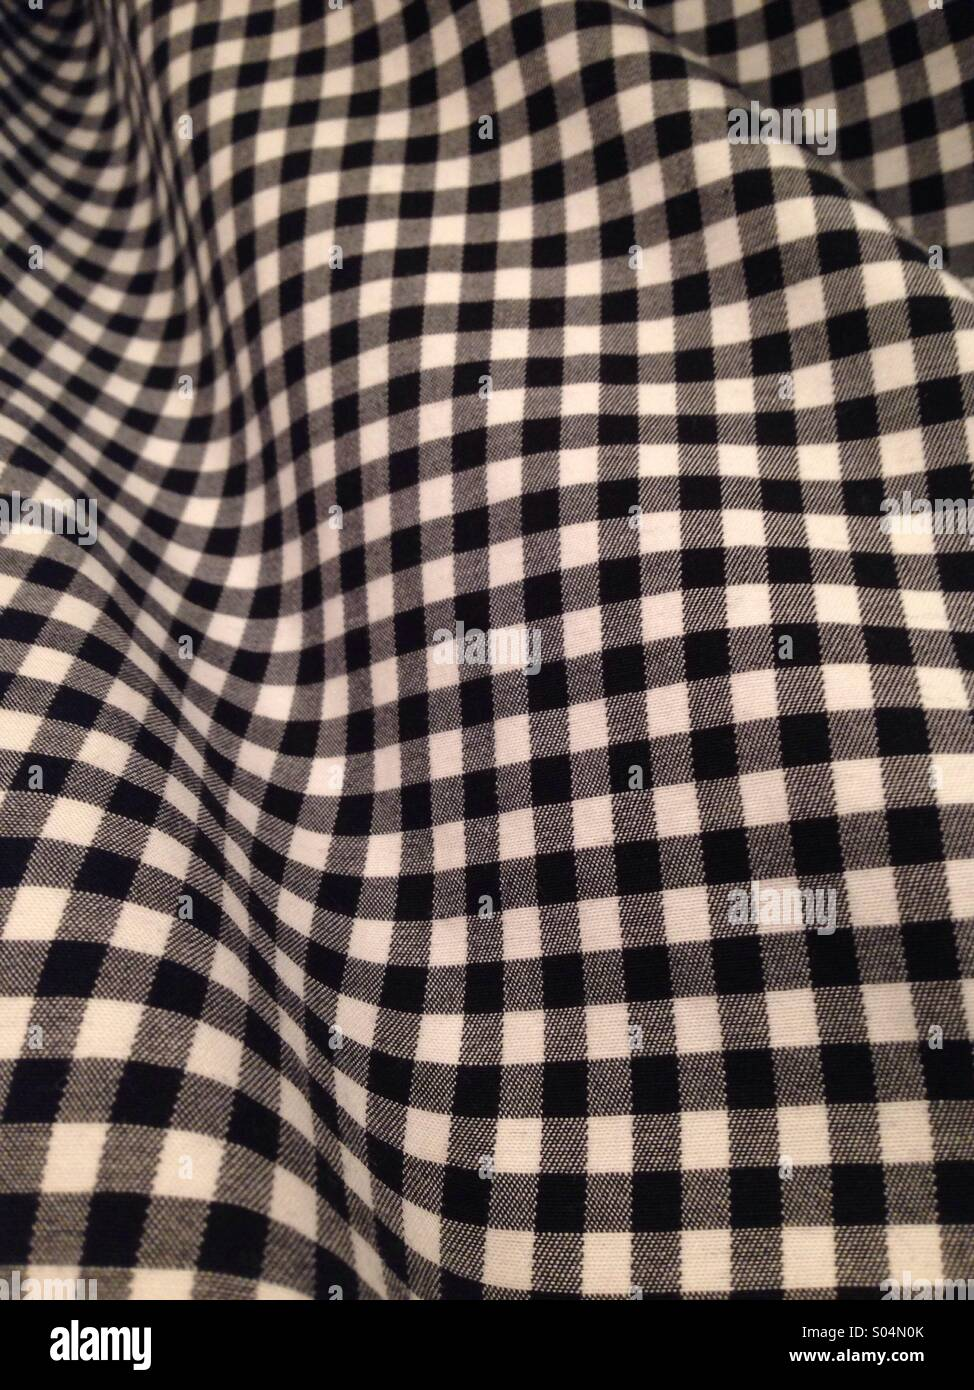 Warped checked fabric, b/w - Stock Image